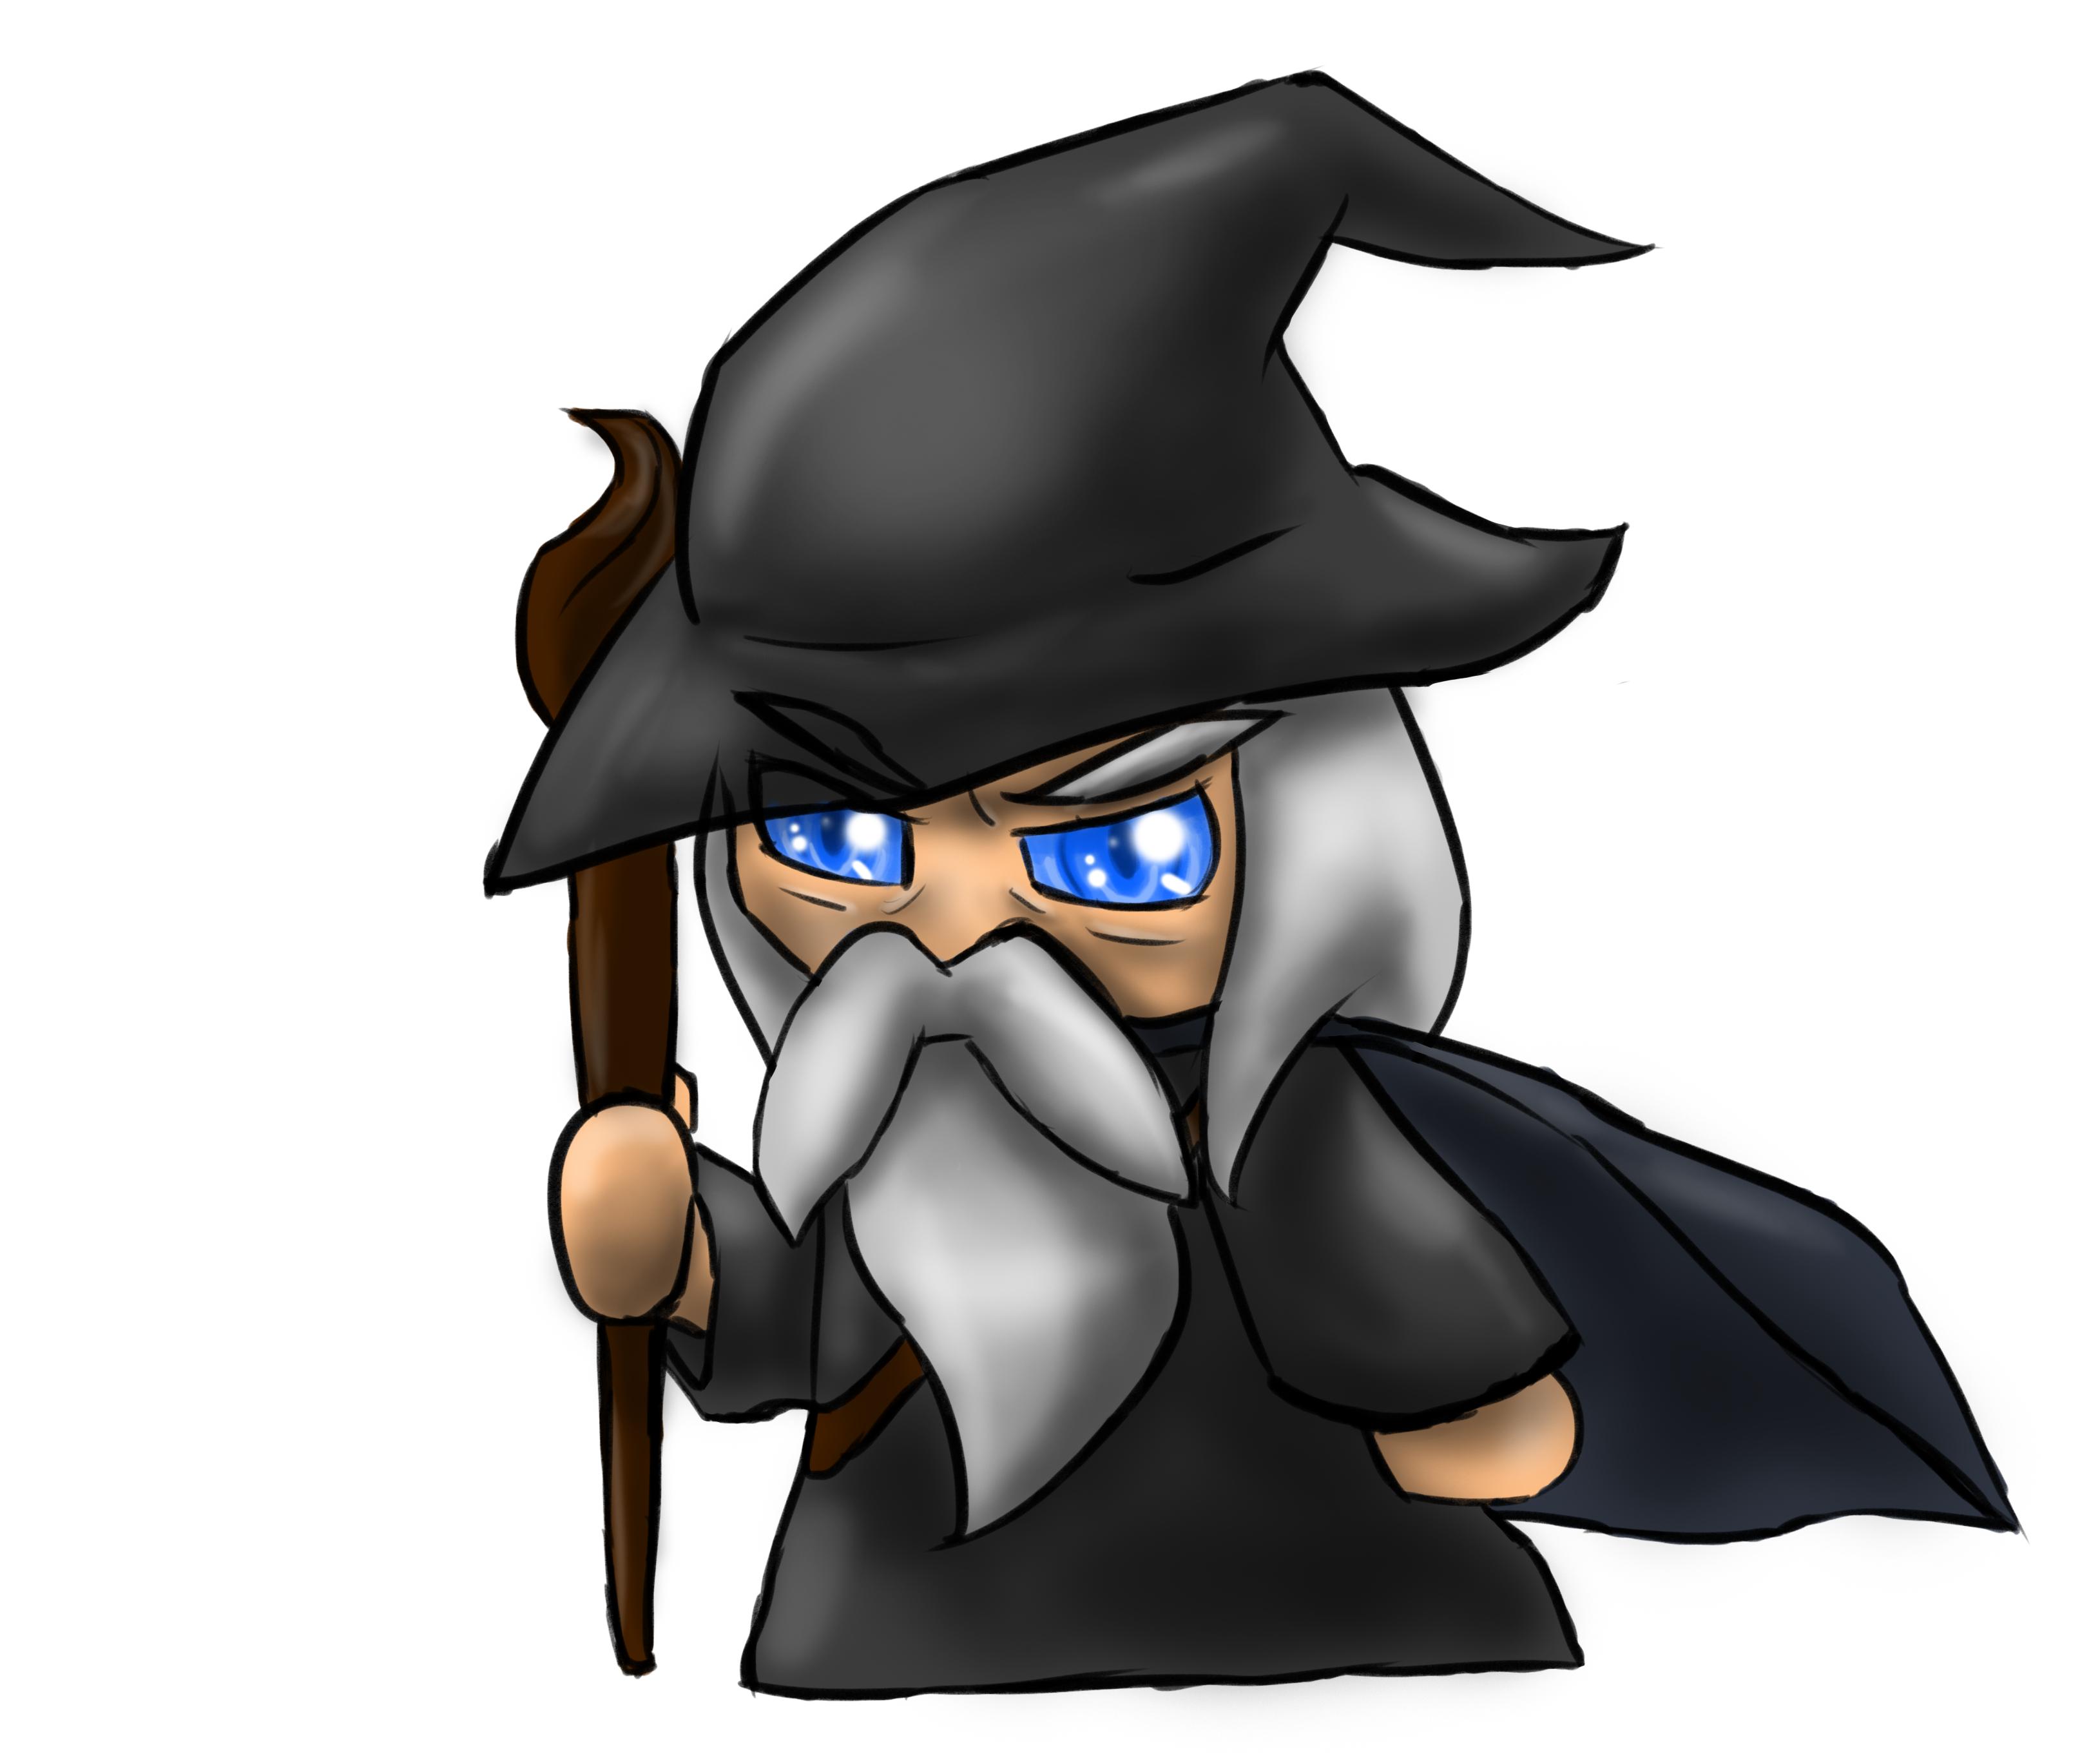 Gandalf clipart cartoon Chibi by DarkStarling716 on Chibi